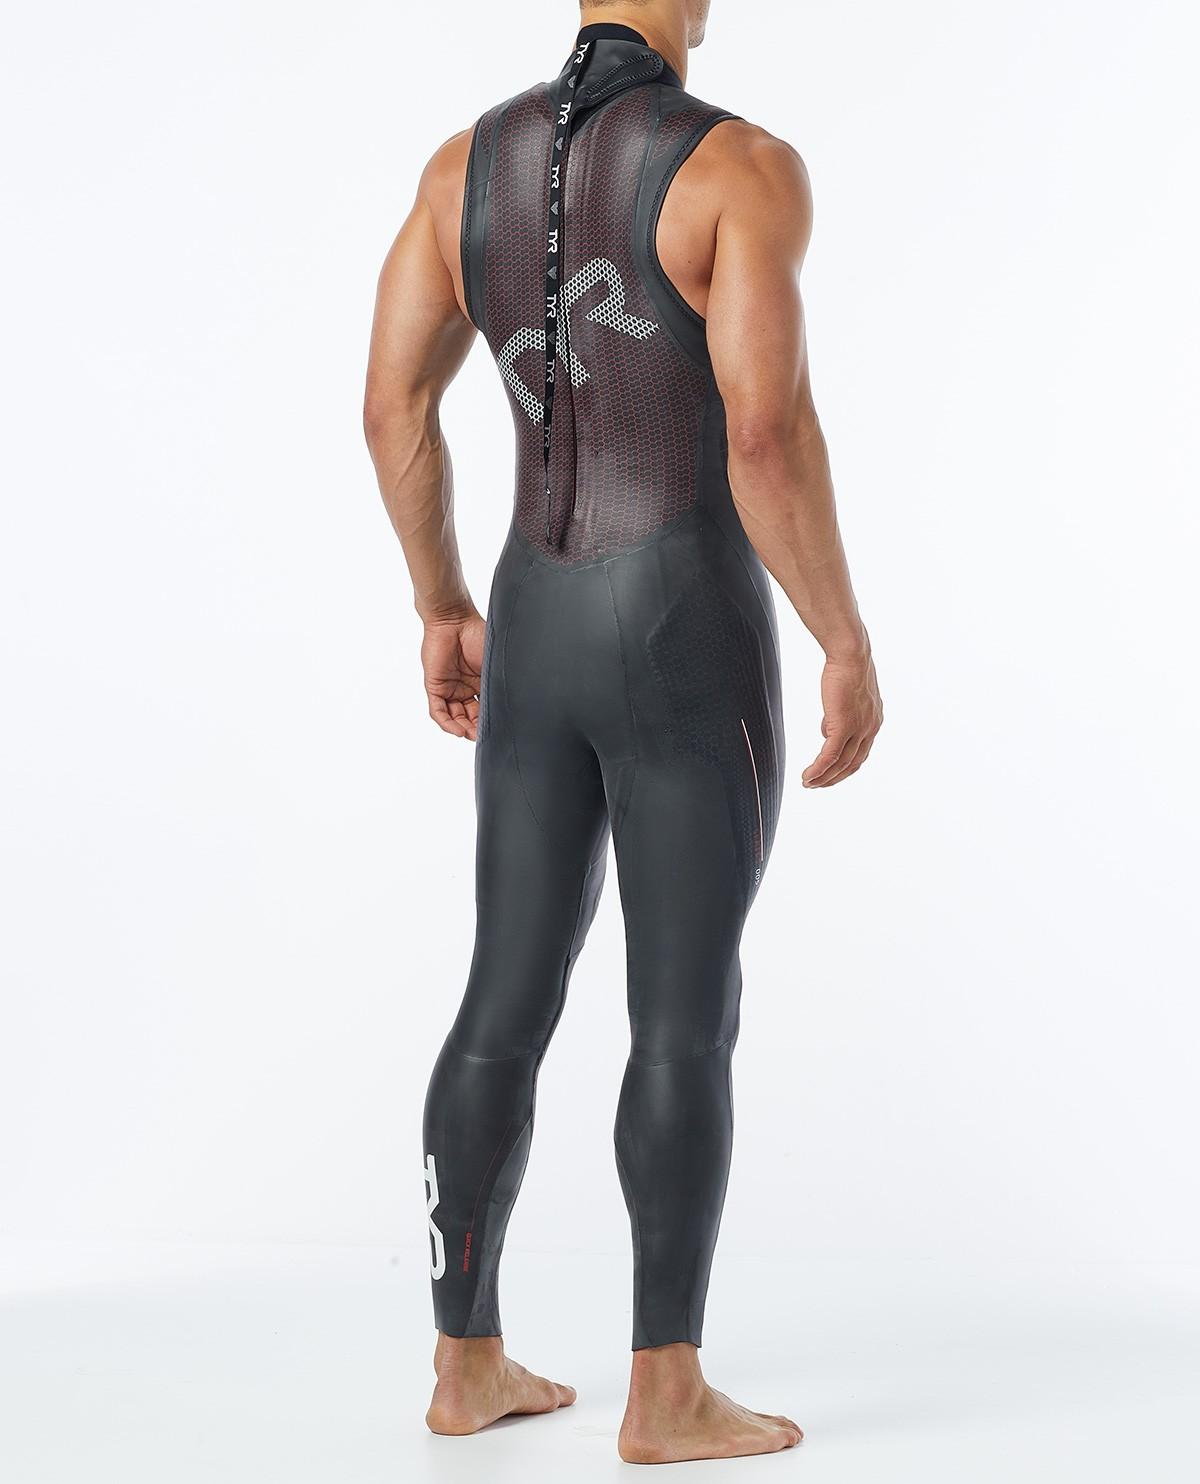 82f9578007e45 ... Mens Triathlon Cat 5 Sleeveless Wetsuit ...